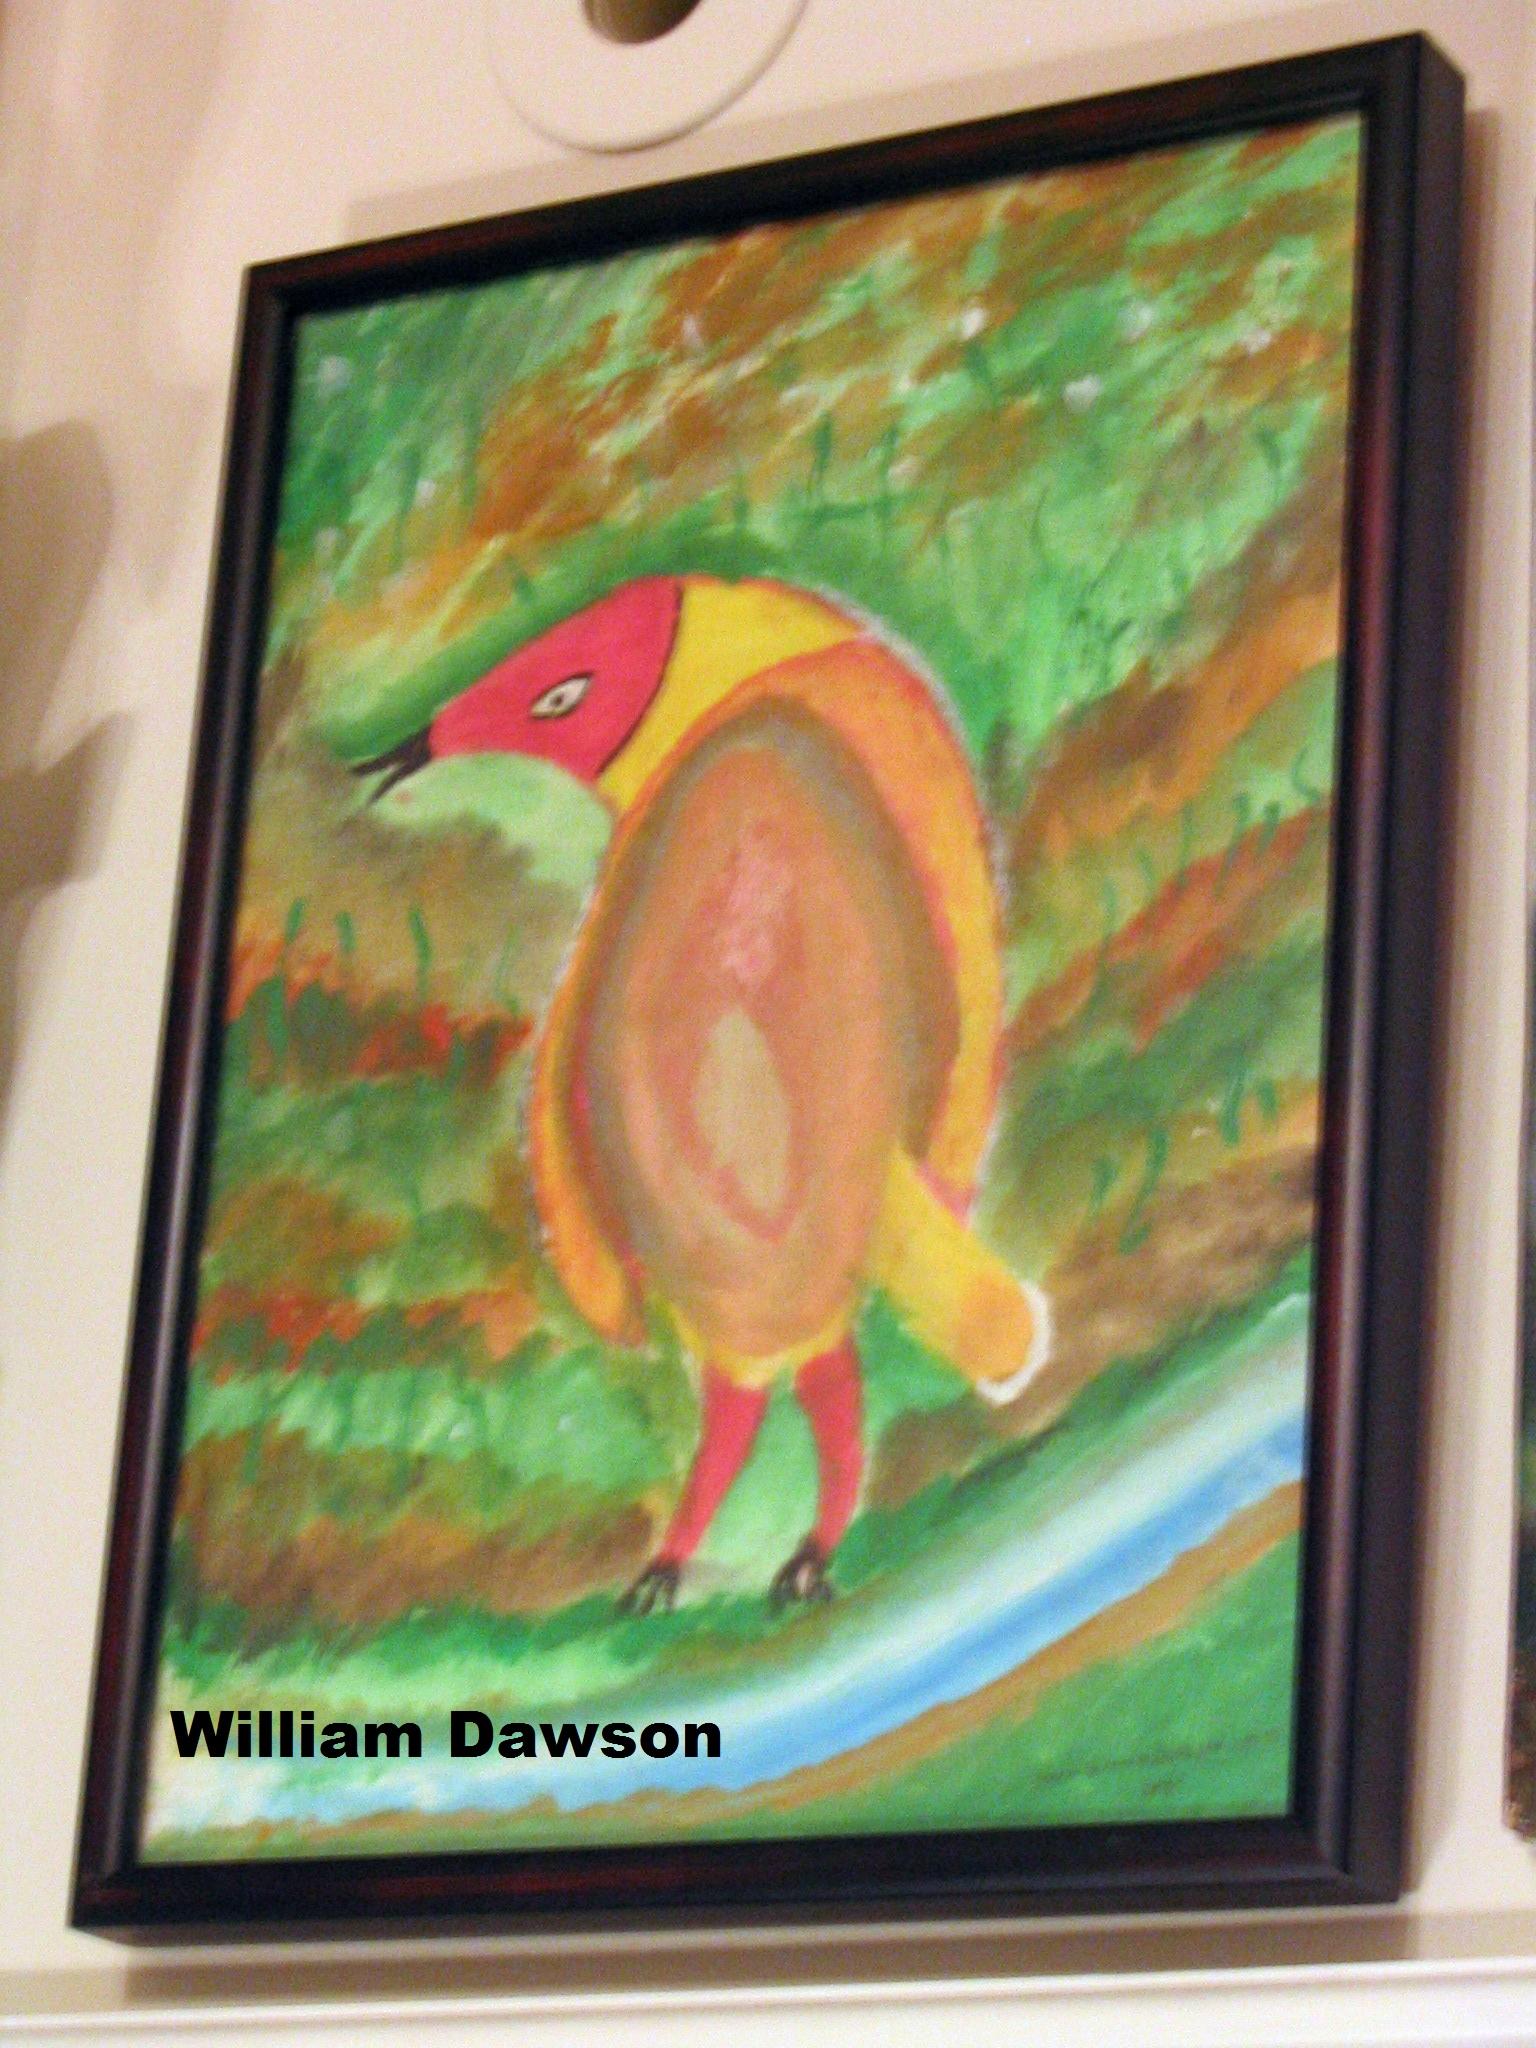 dawson, william bird painting on paper.jpg